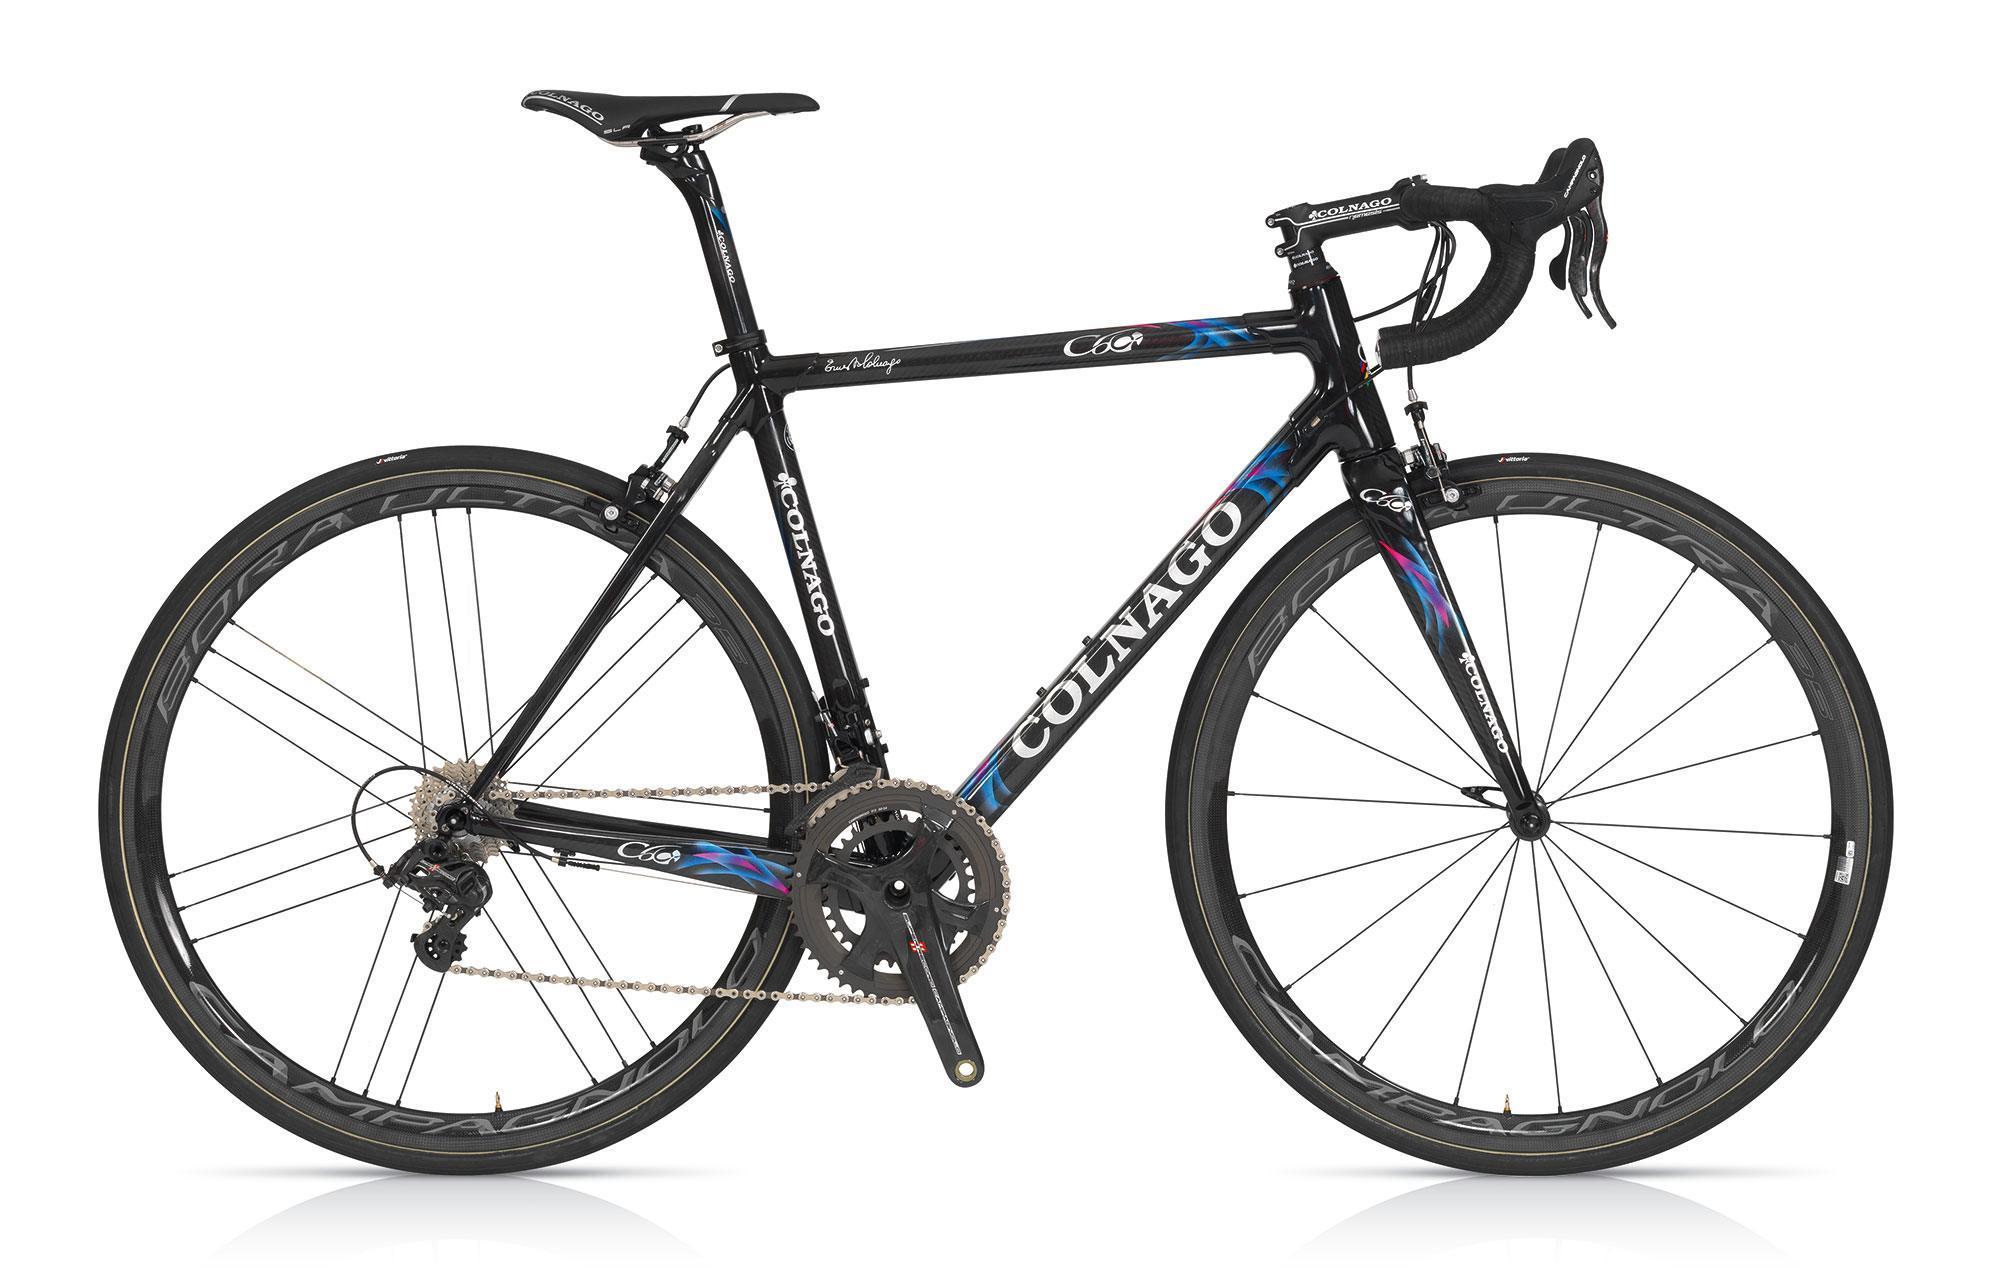 cefe4a35da8 Colnago Road Bikes For Sale   R&A Cycles